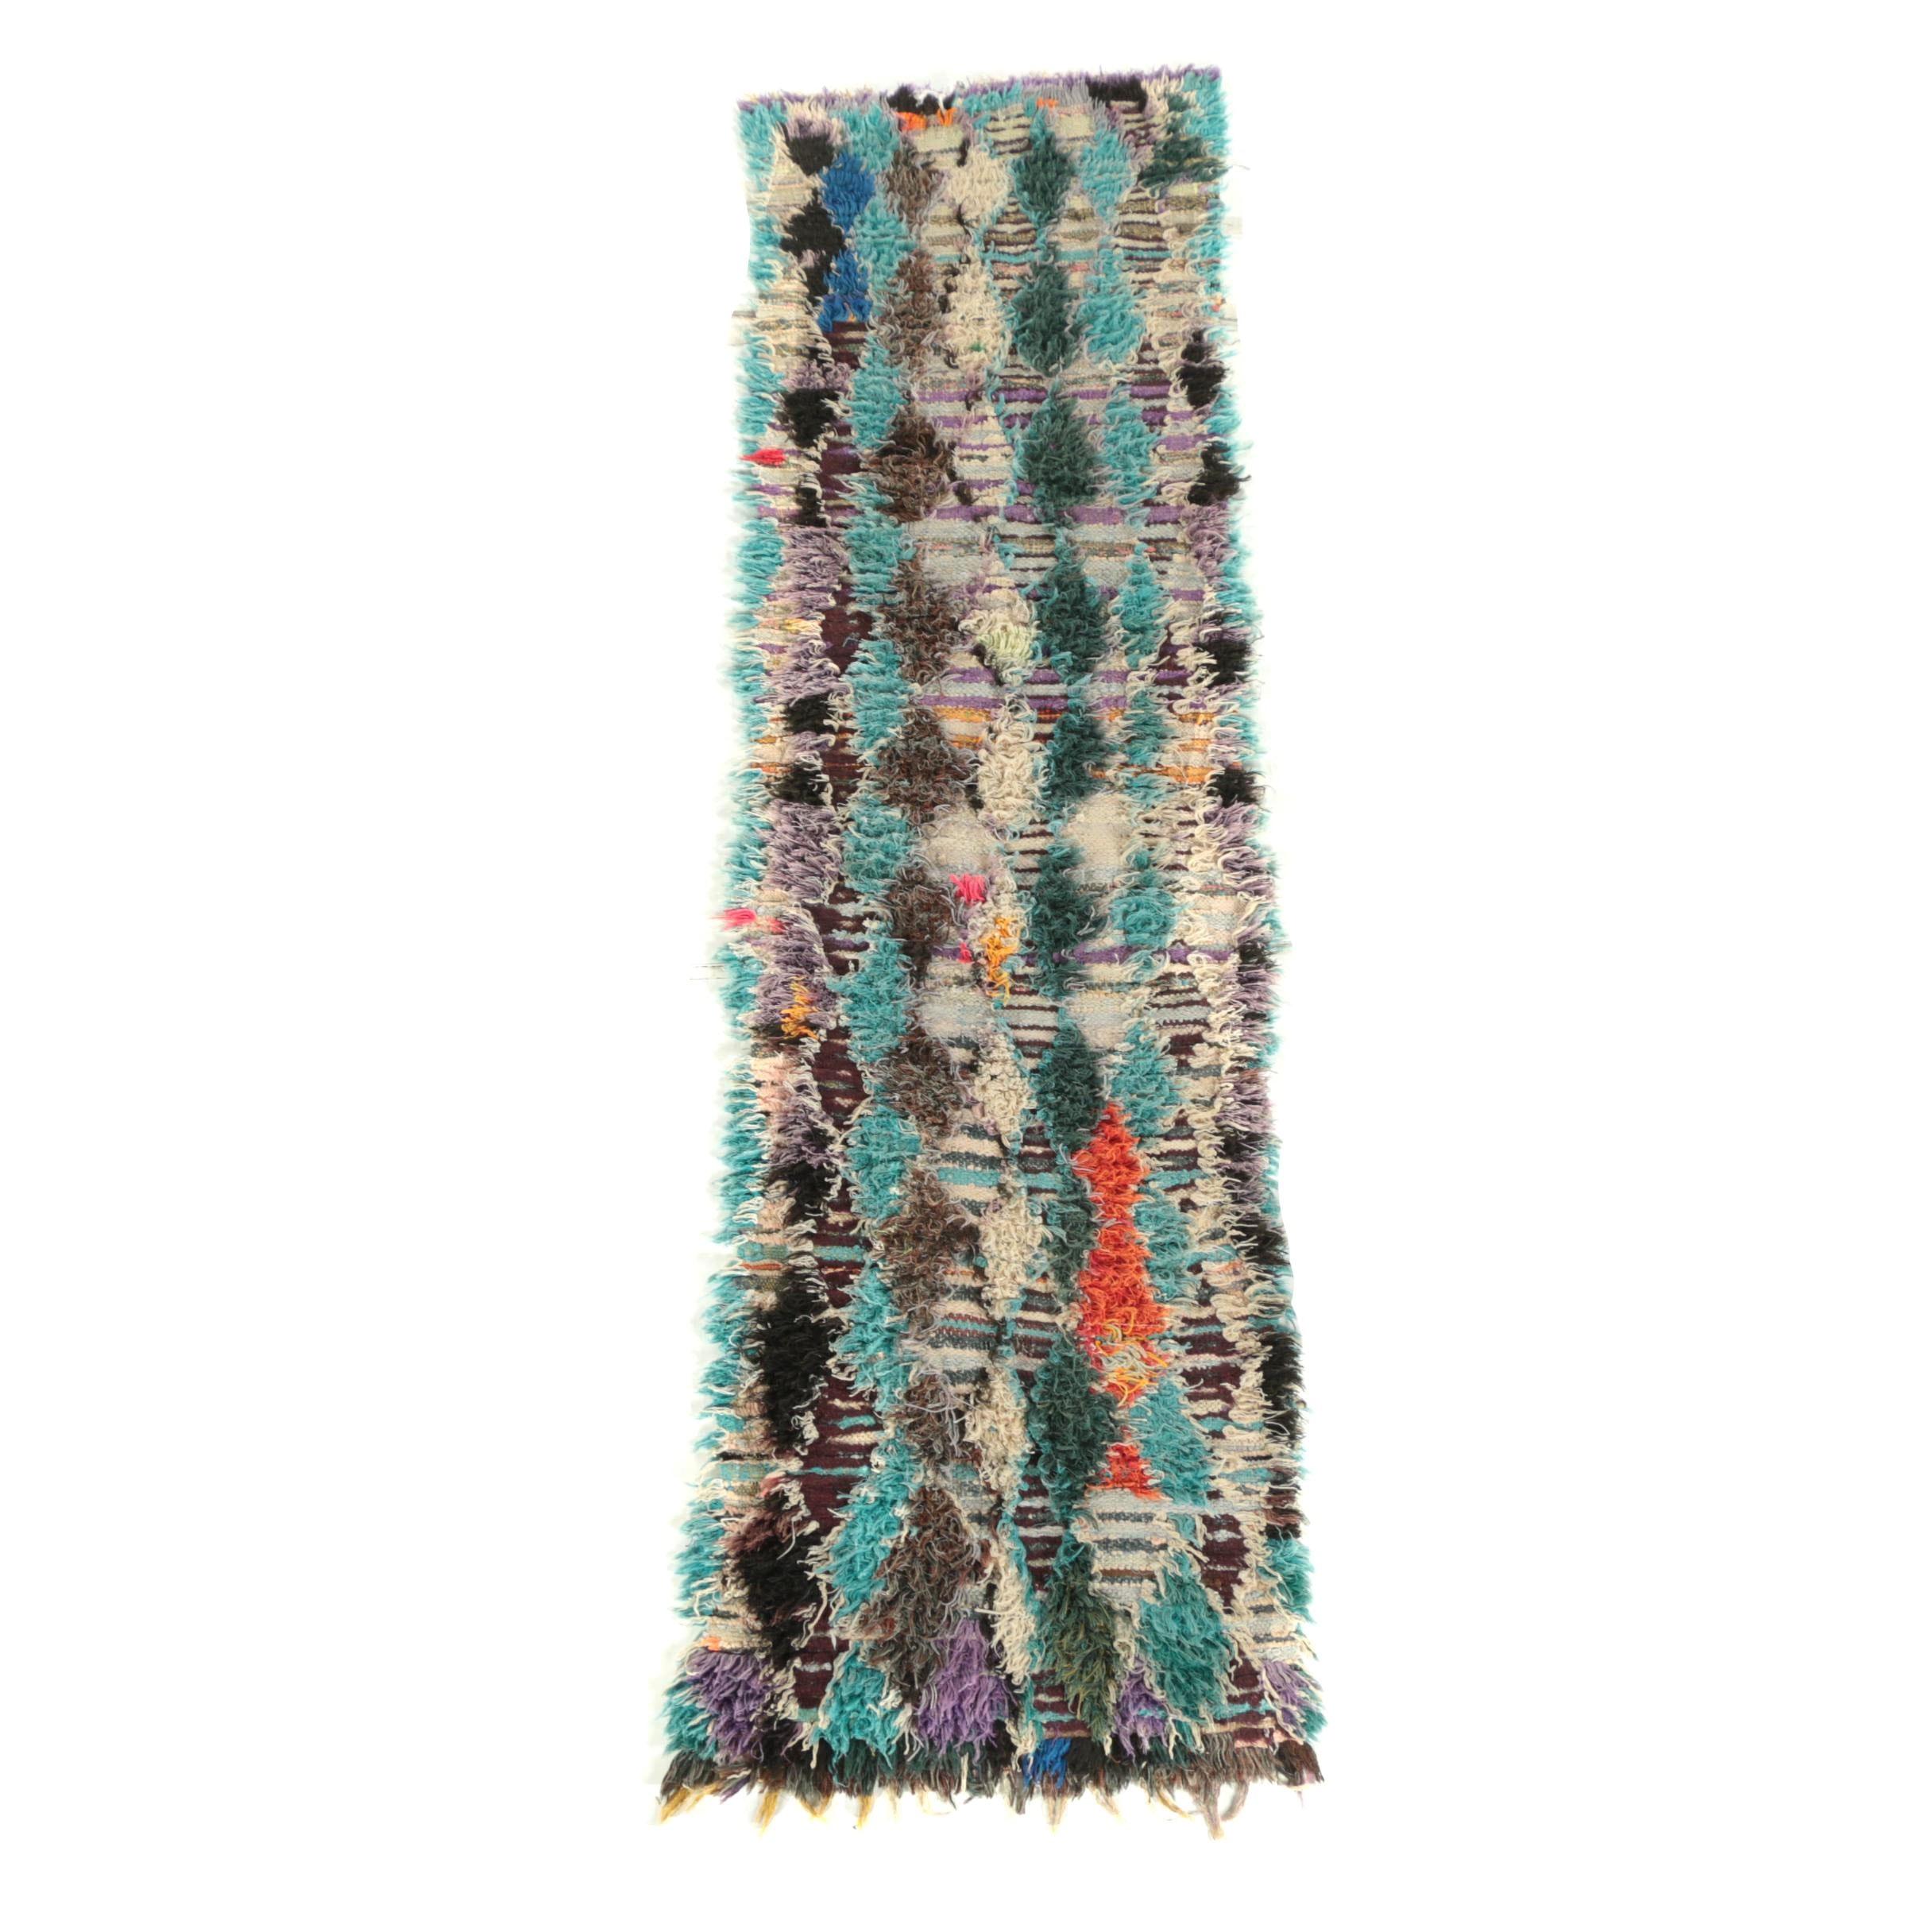 Hand-Knotted Moroccan Boucherouite Cotton Runner